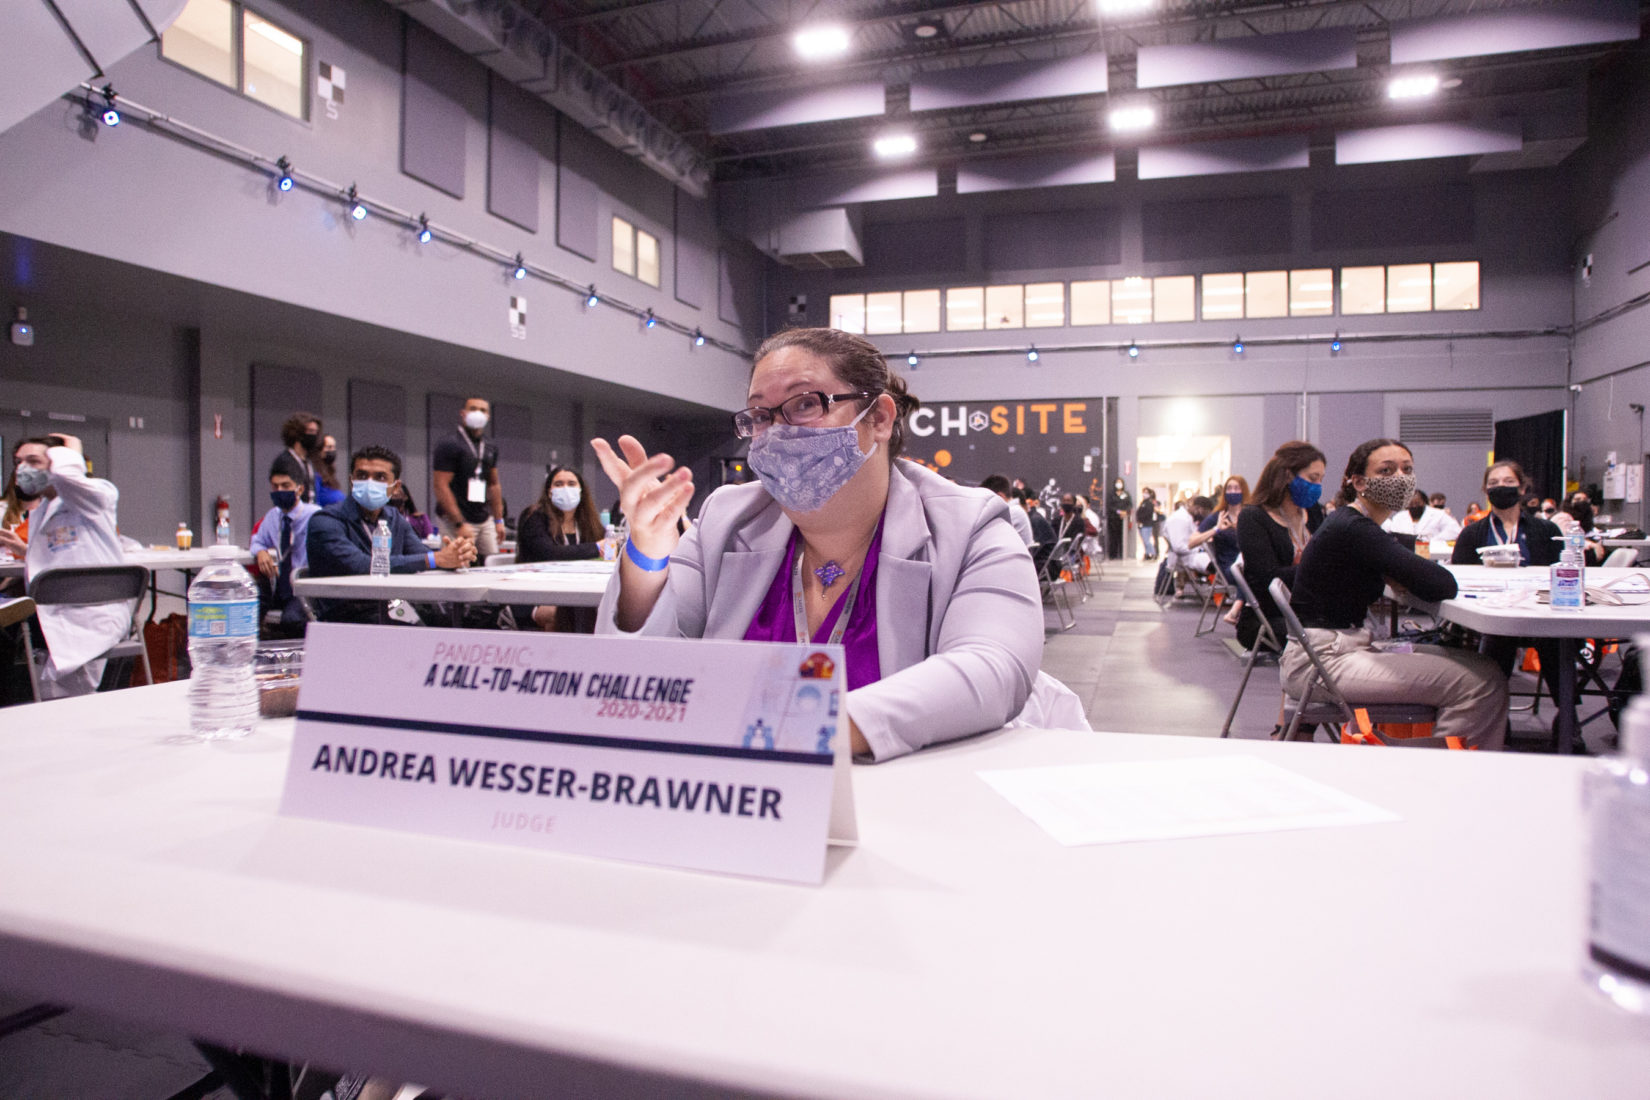 Andrea Wesser-Brawner Orange County Profile in Tech